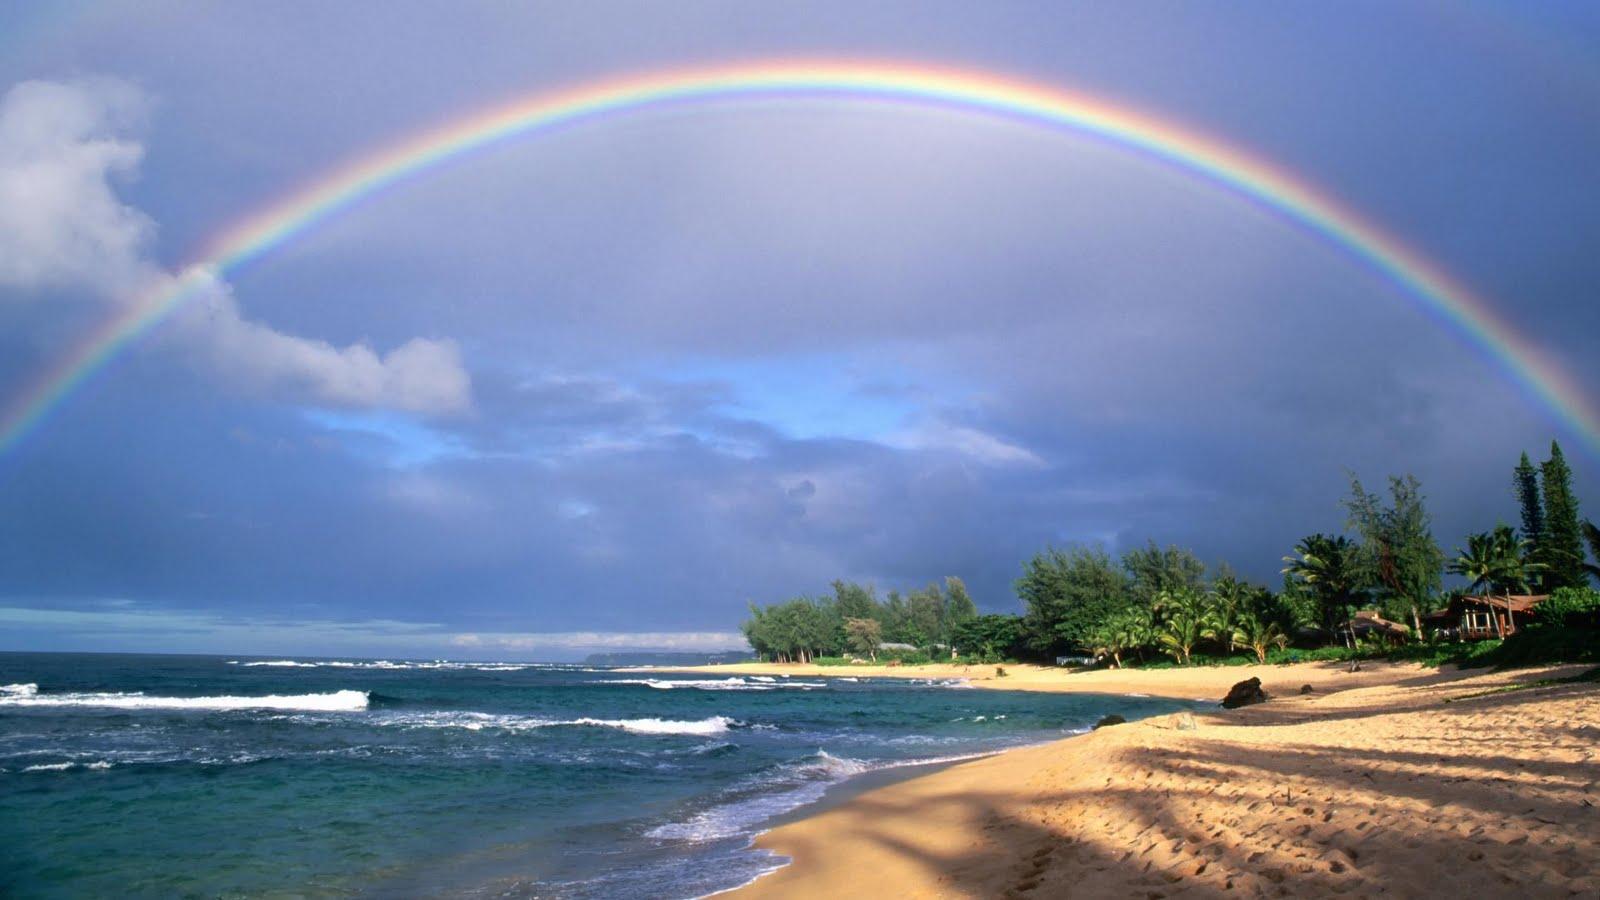 Video Beautiful Rainbows and Lightnings Full HD Wallpapers 1080p 1600x900